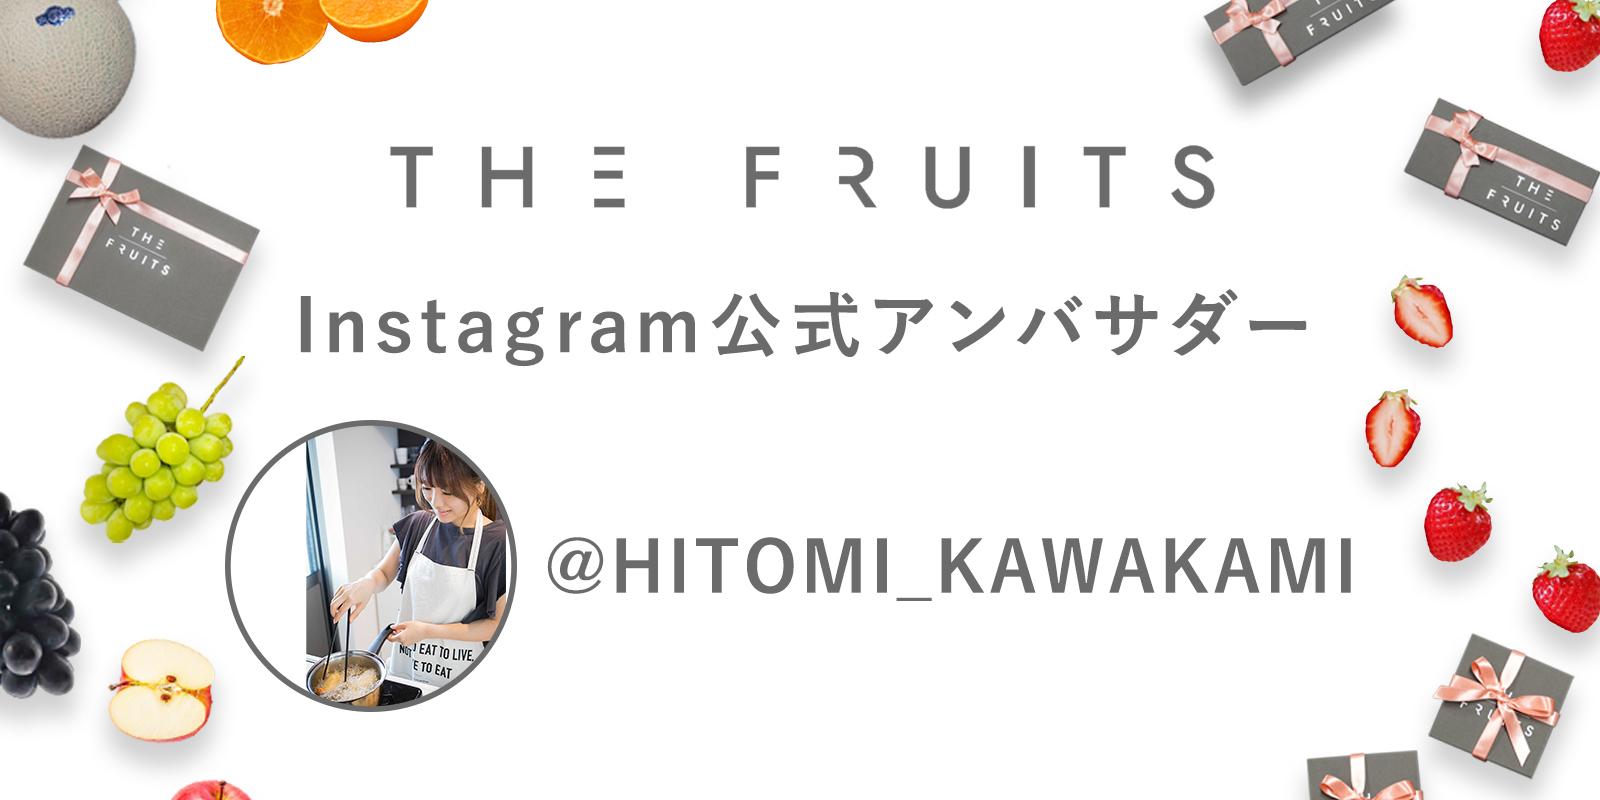 THE FRUITS公式アンバサダー就任のお知らせ @hitomi_kawakamiのイメージ